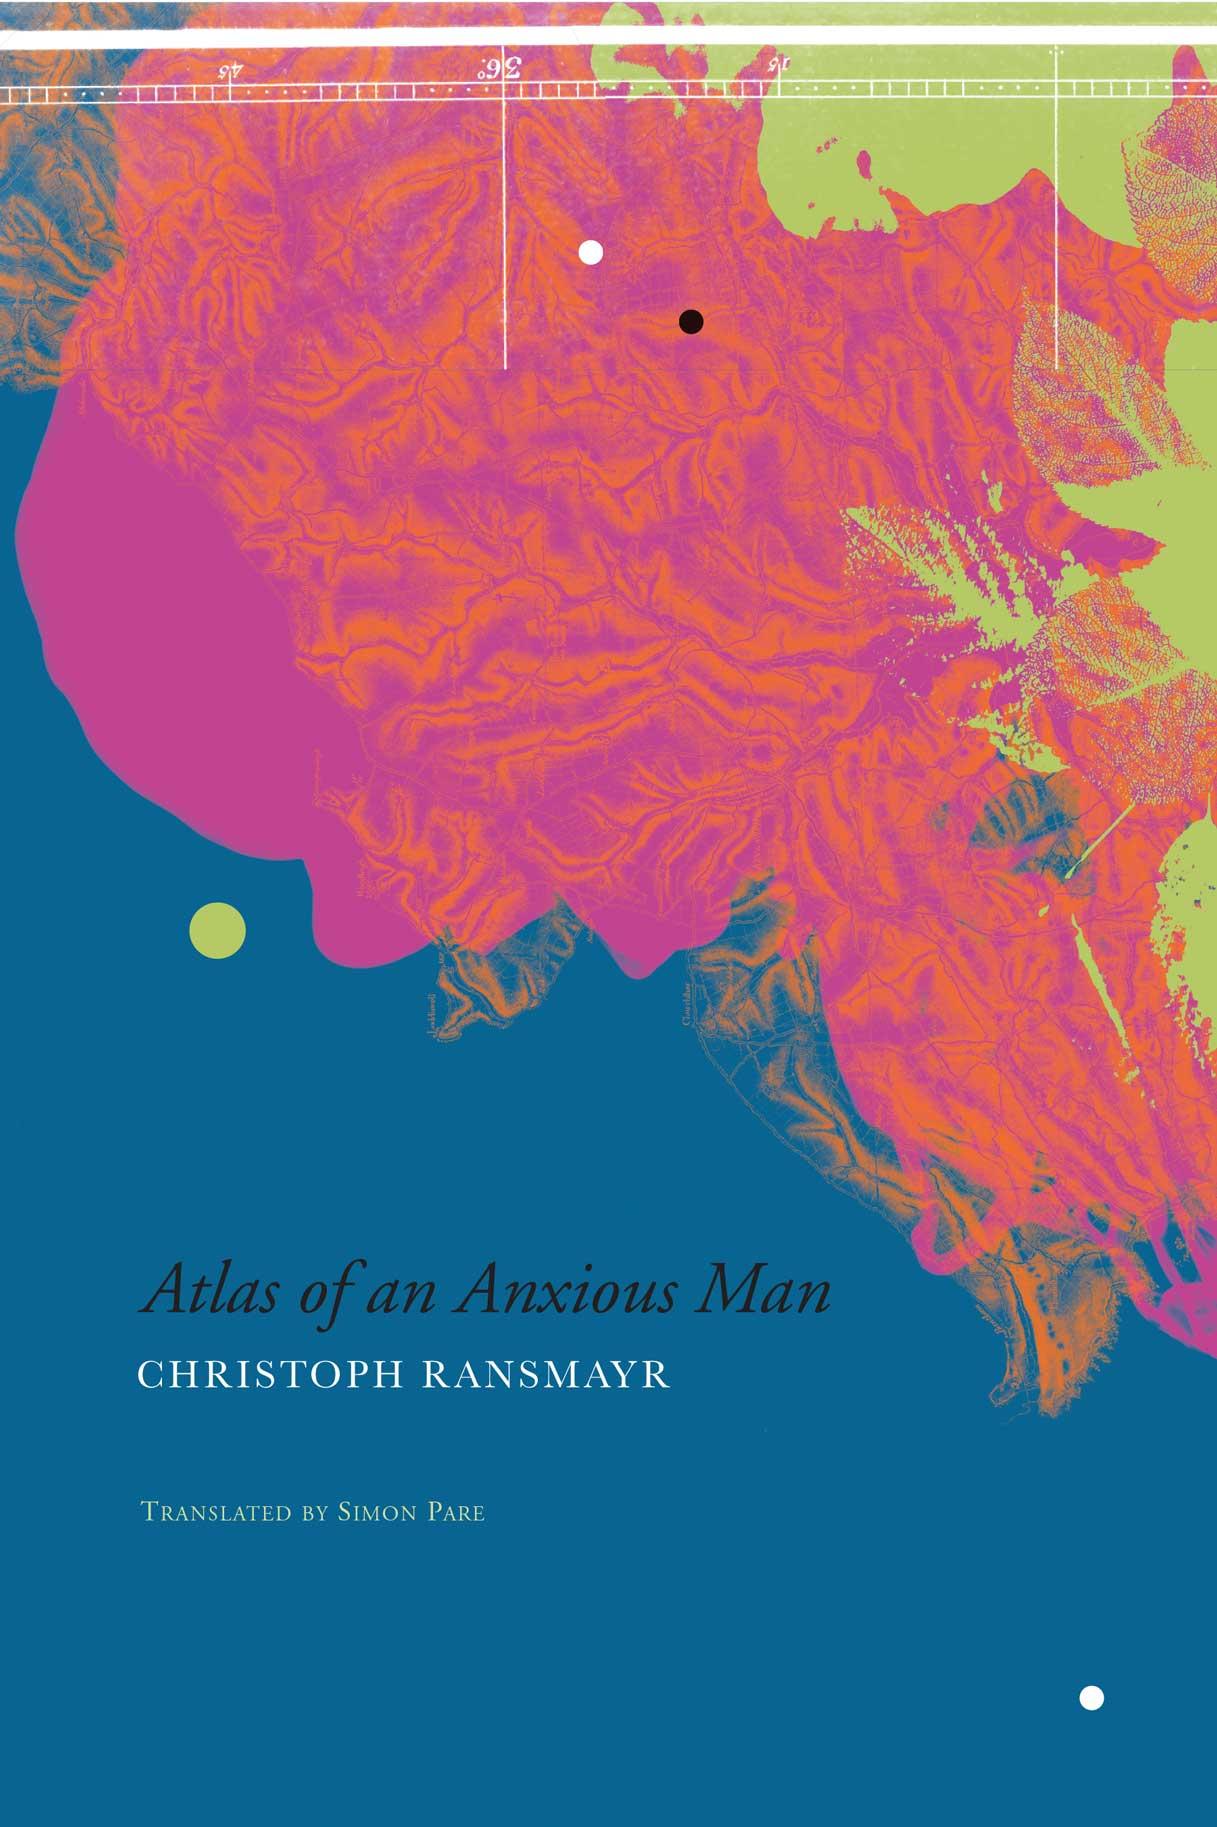 Atlas of an Anxious Man  by Christoph Ransmayr | Seagull Books